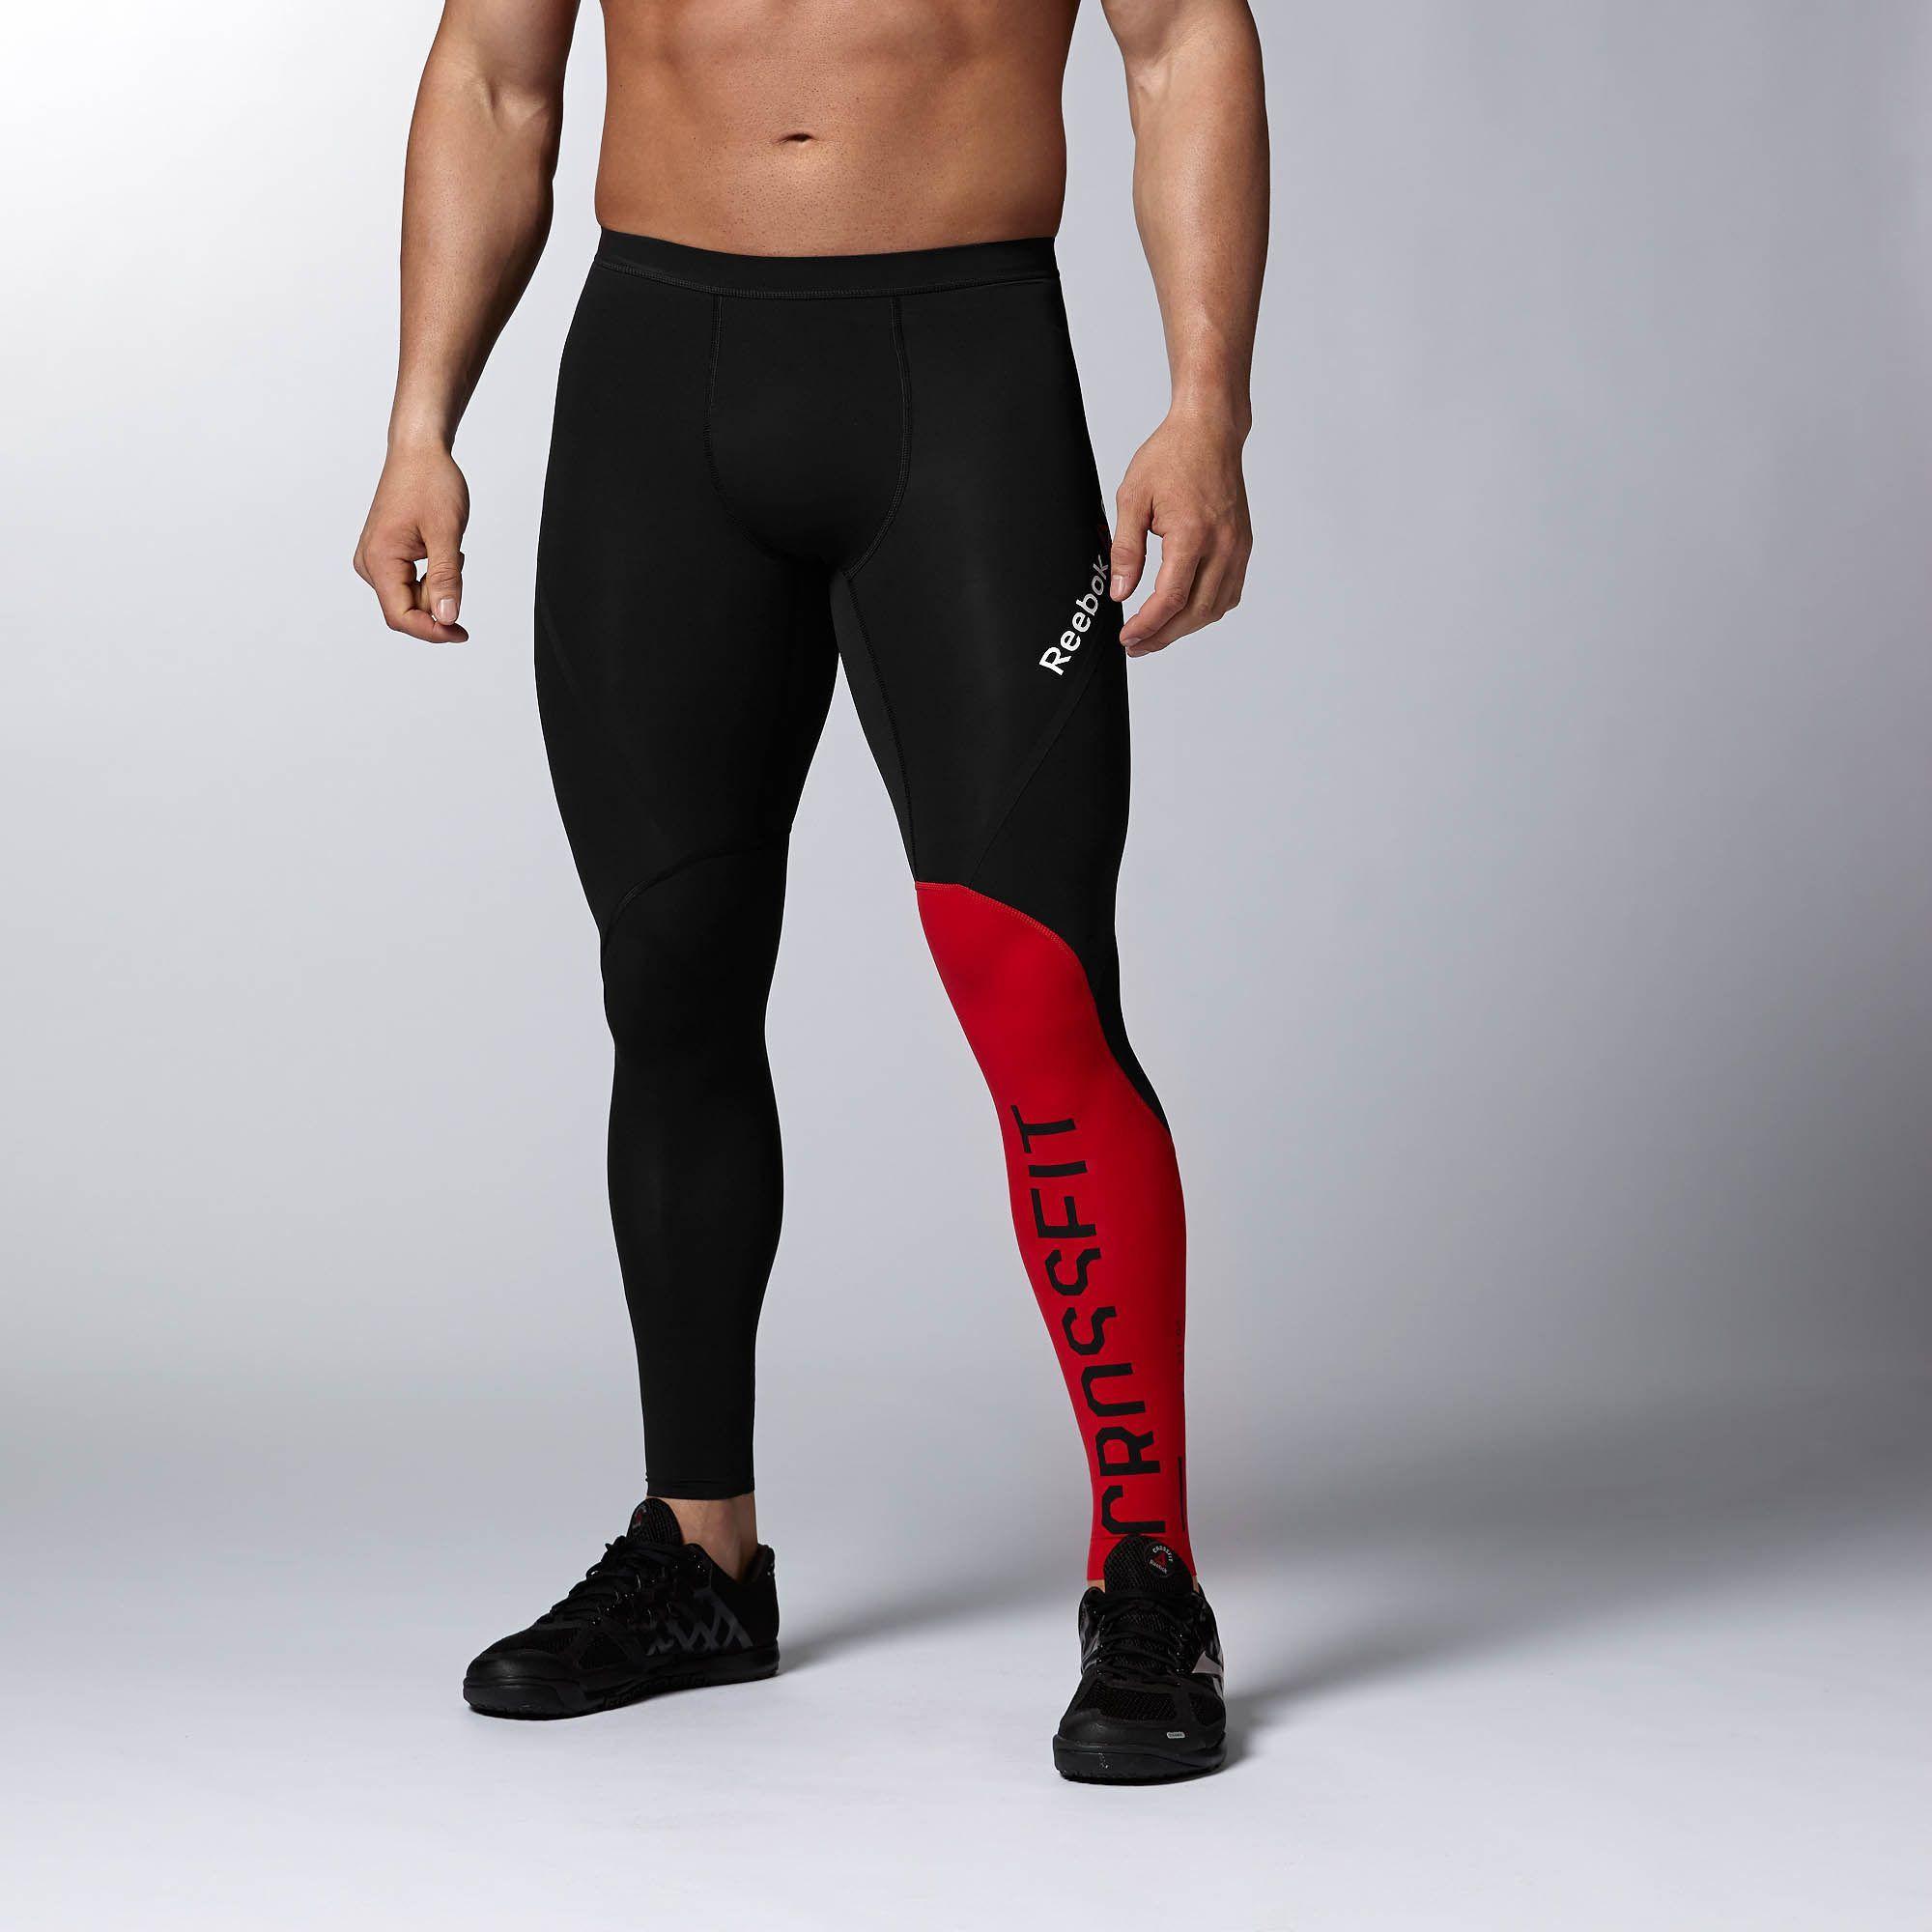 8e052025501c Reebok - Men s Reebok CrossFit Compression Tight Gym Leggings